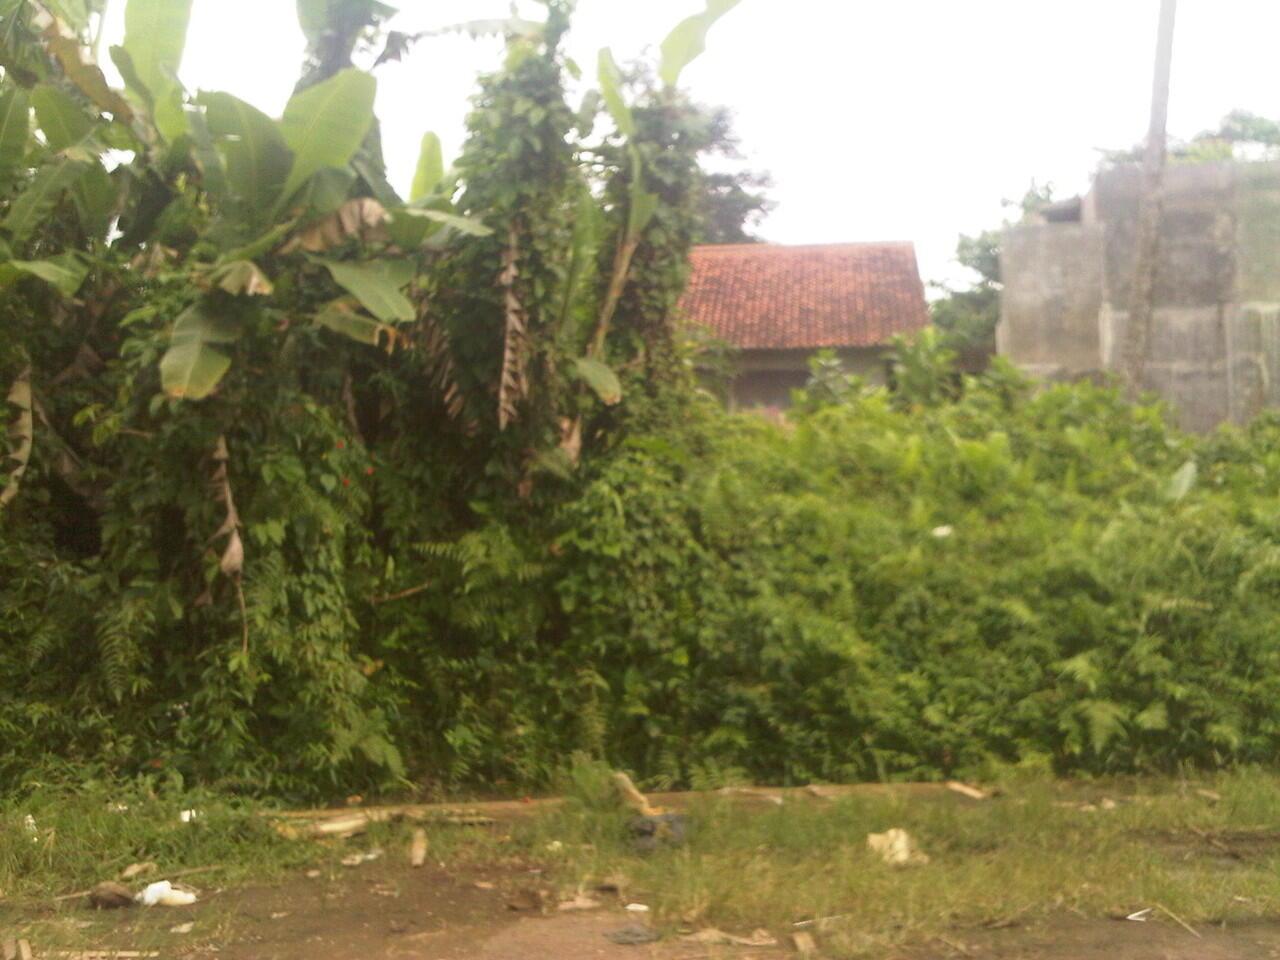 ... jual tanah di jalan cipedes kel.nagarasari kec.cipedes dekat sentra  batik Tasikmalaya ... 7f009a37e2